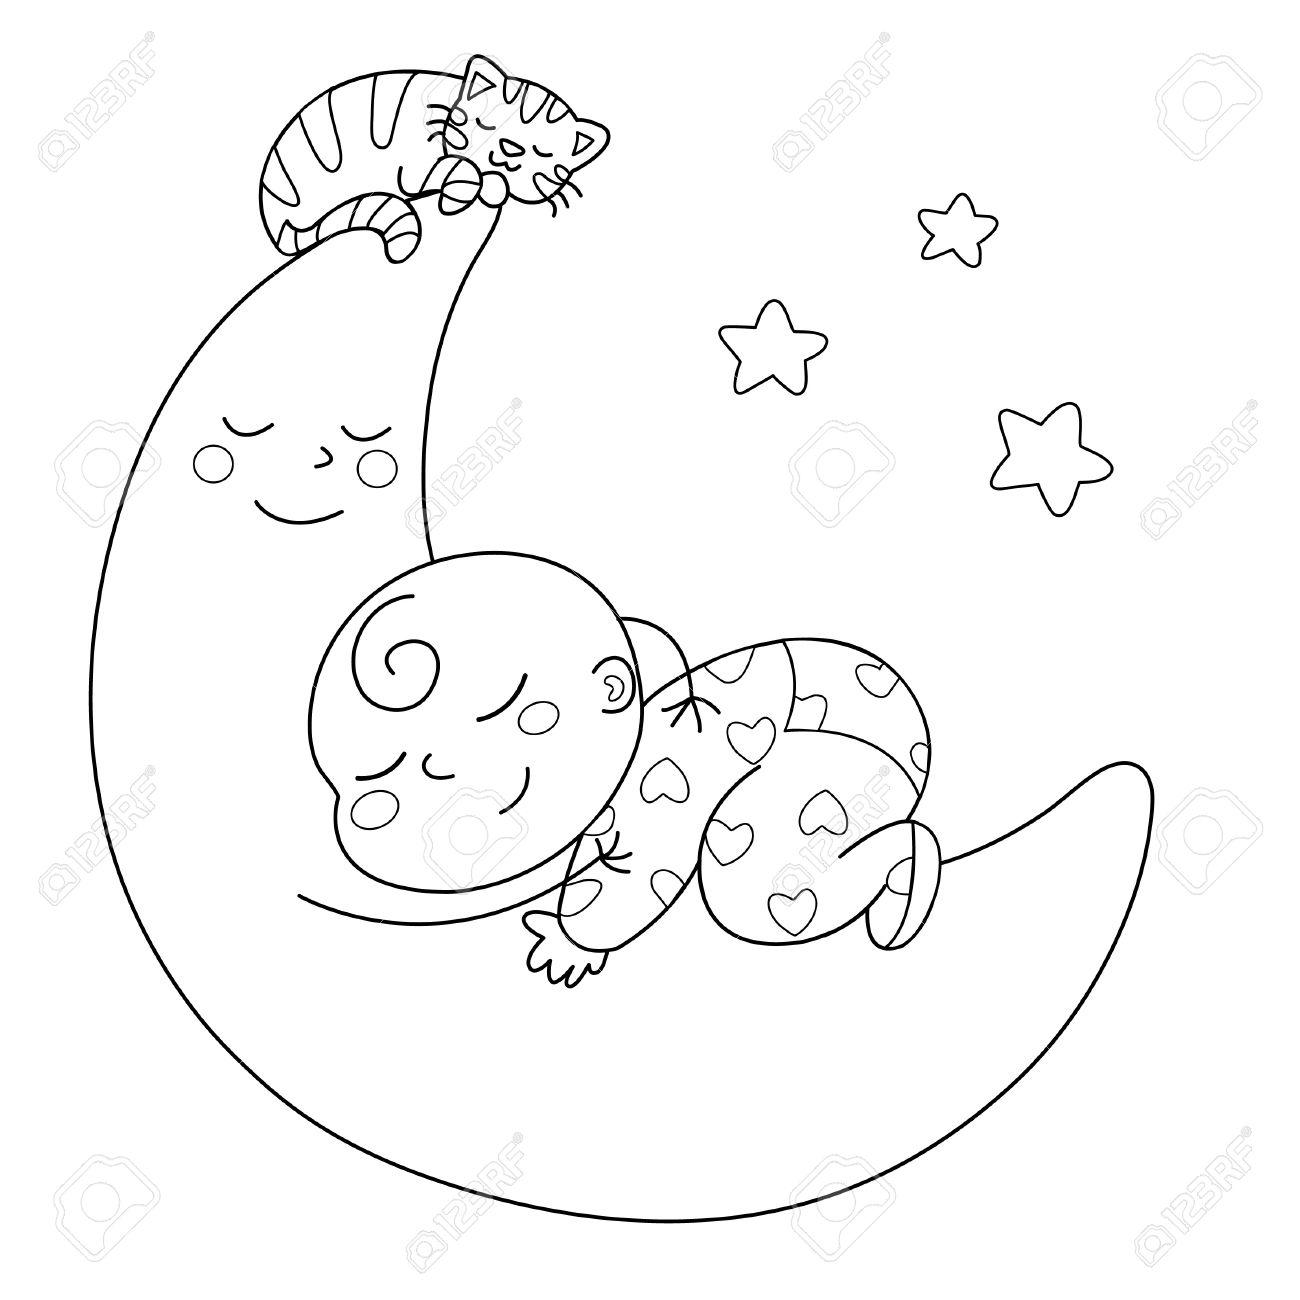 Black And White Baby Sleeping: Baby Sleeping Drawing At GetDrawings.com